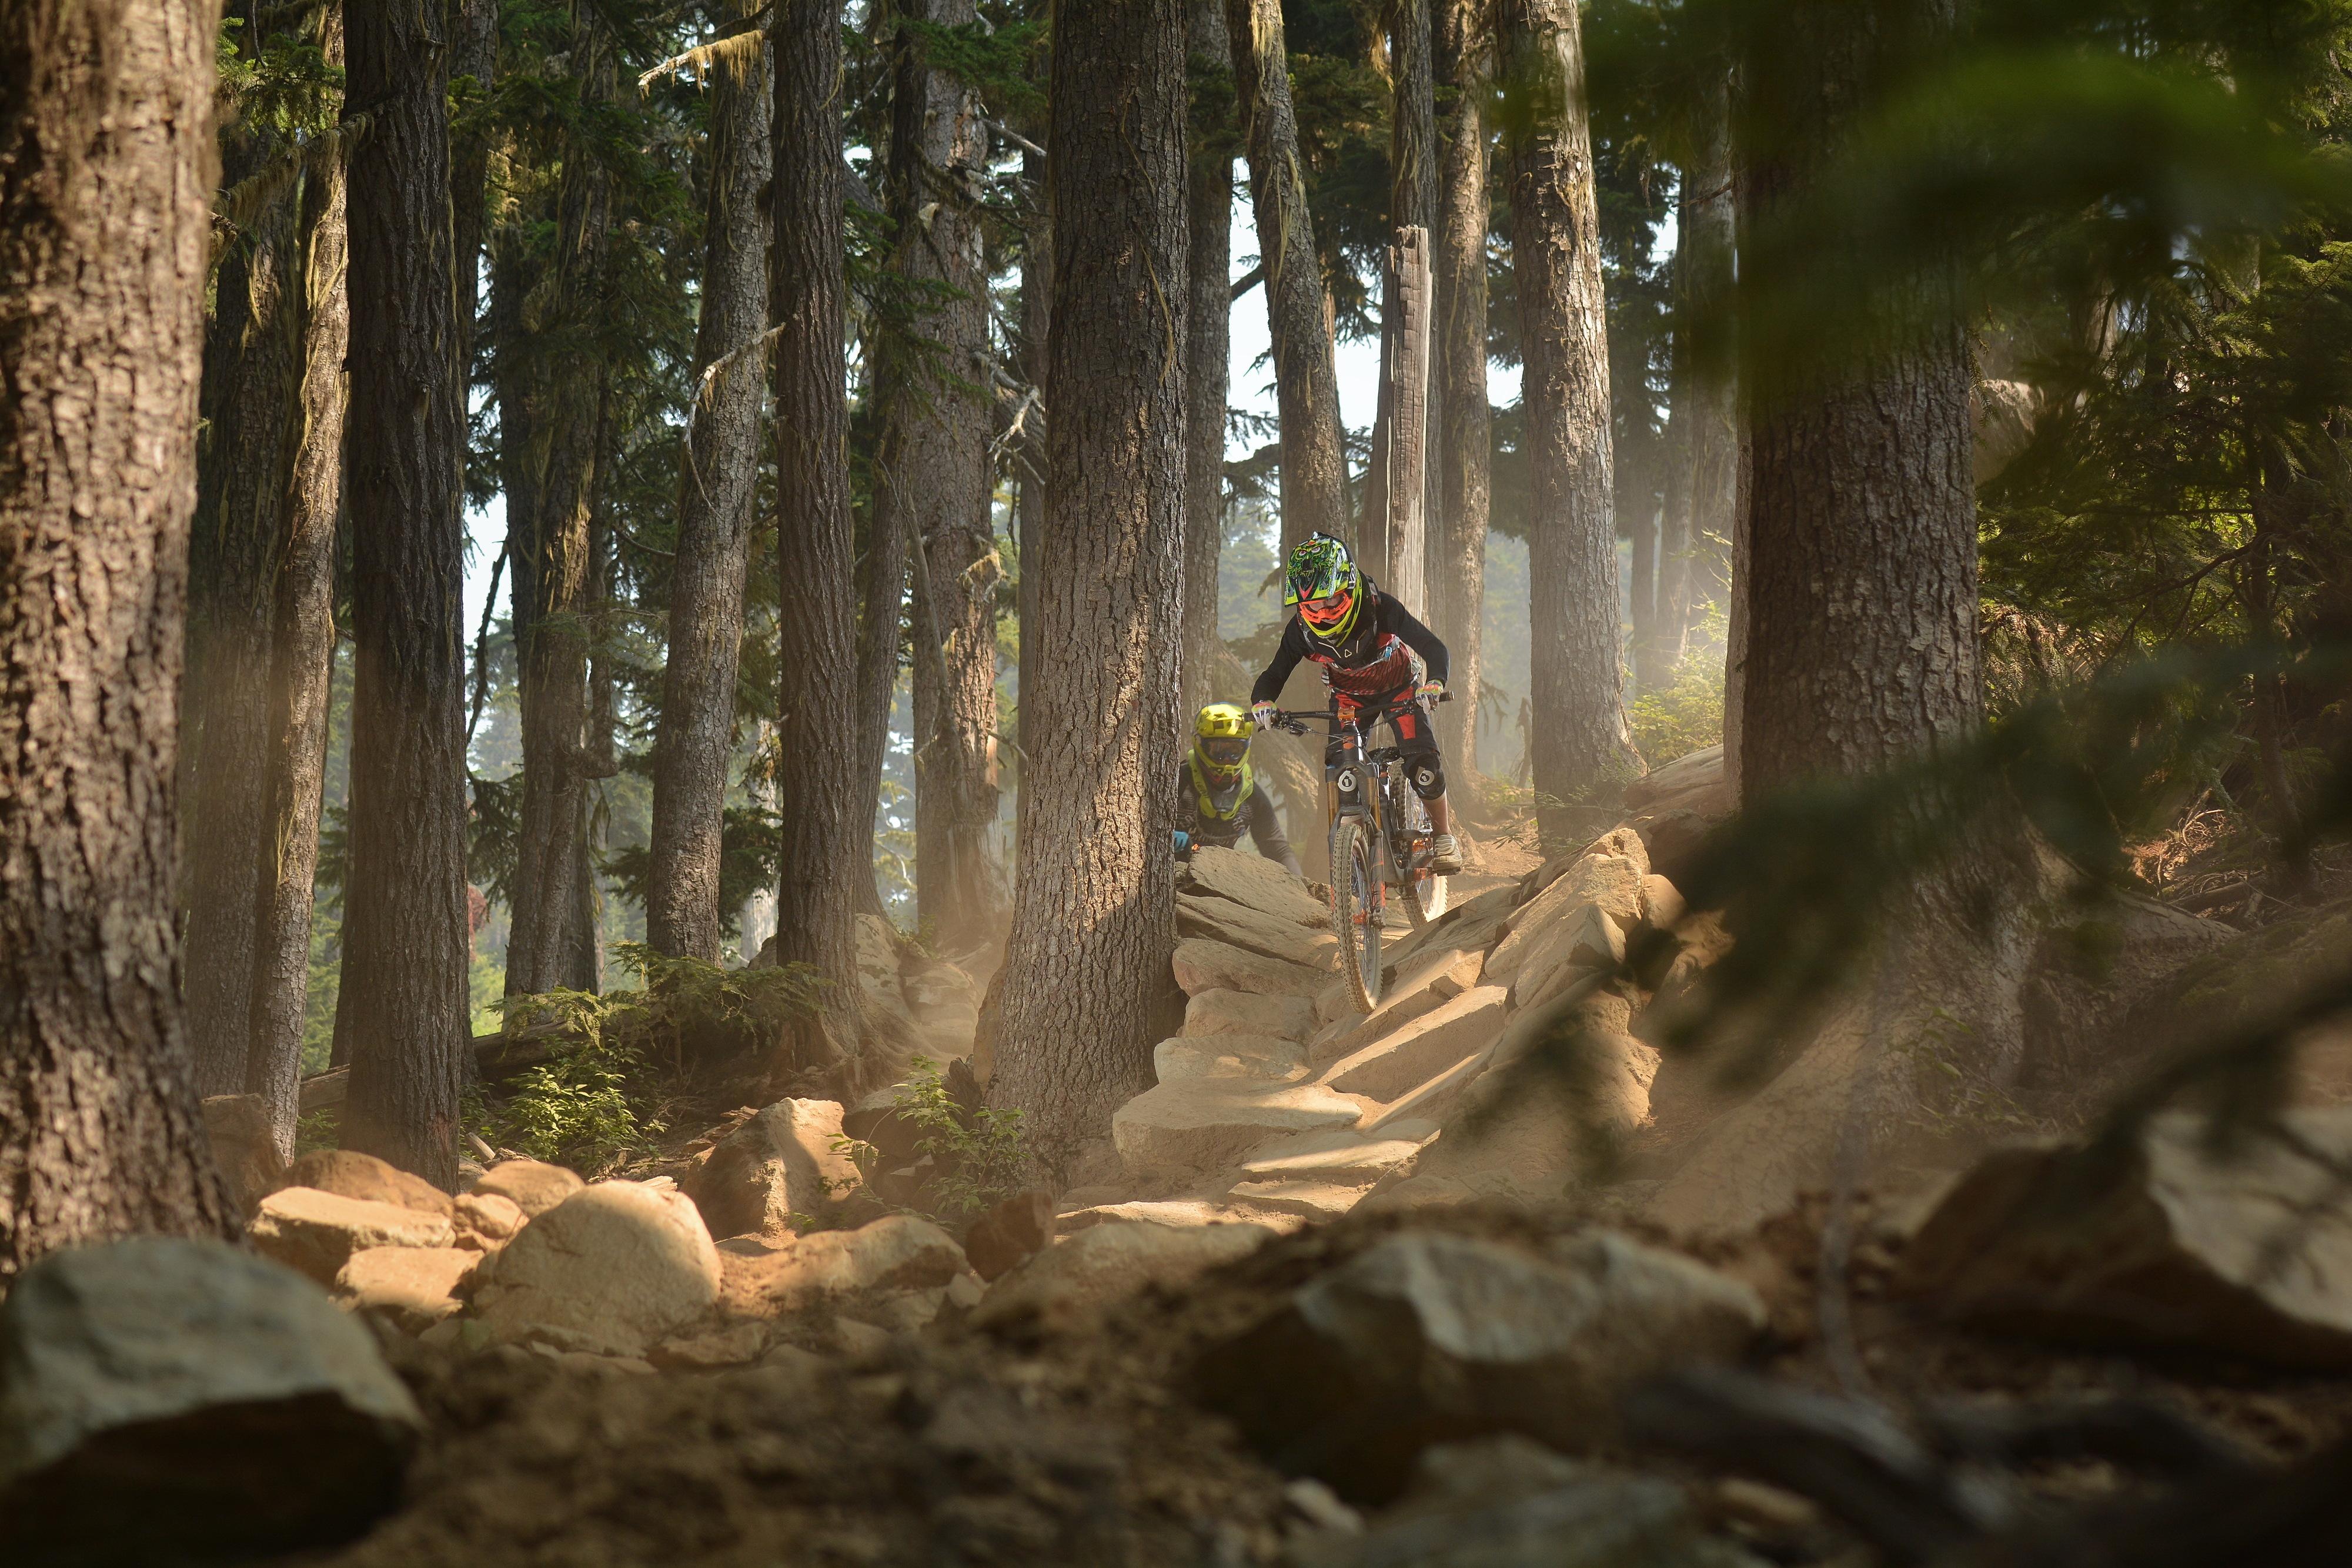 MeekBoyz Premium Kids Downhill Mountain Bike